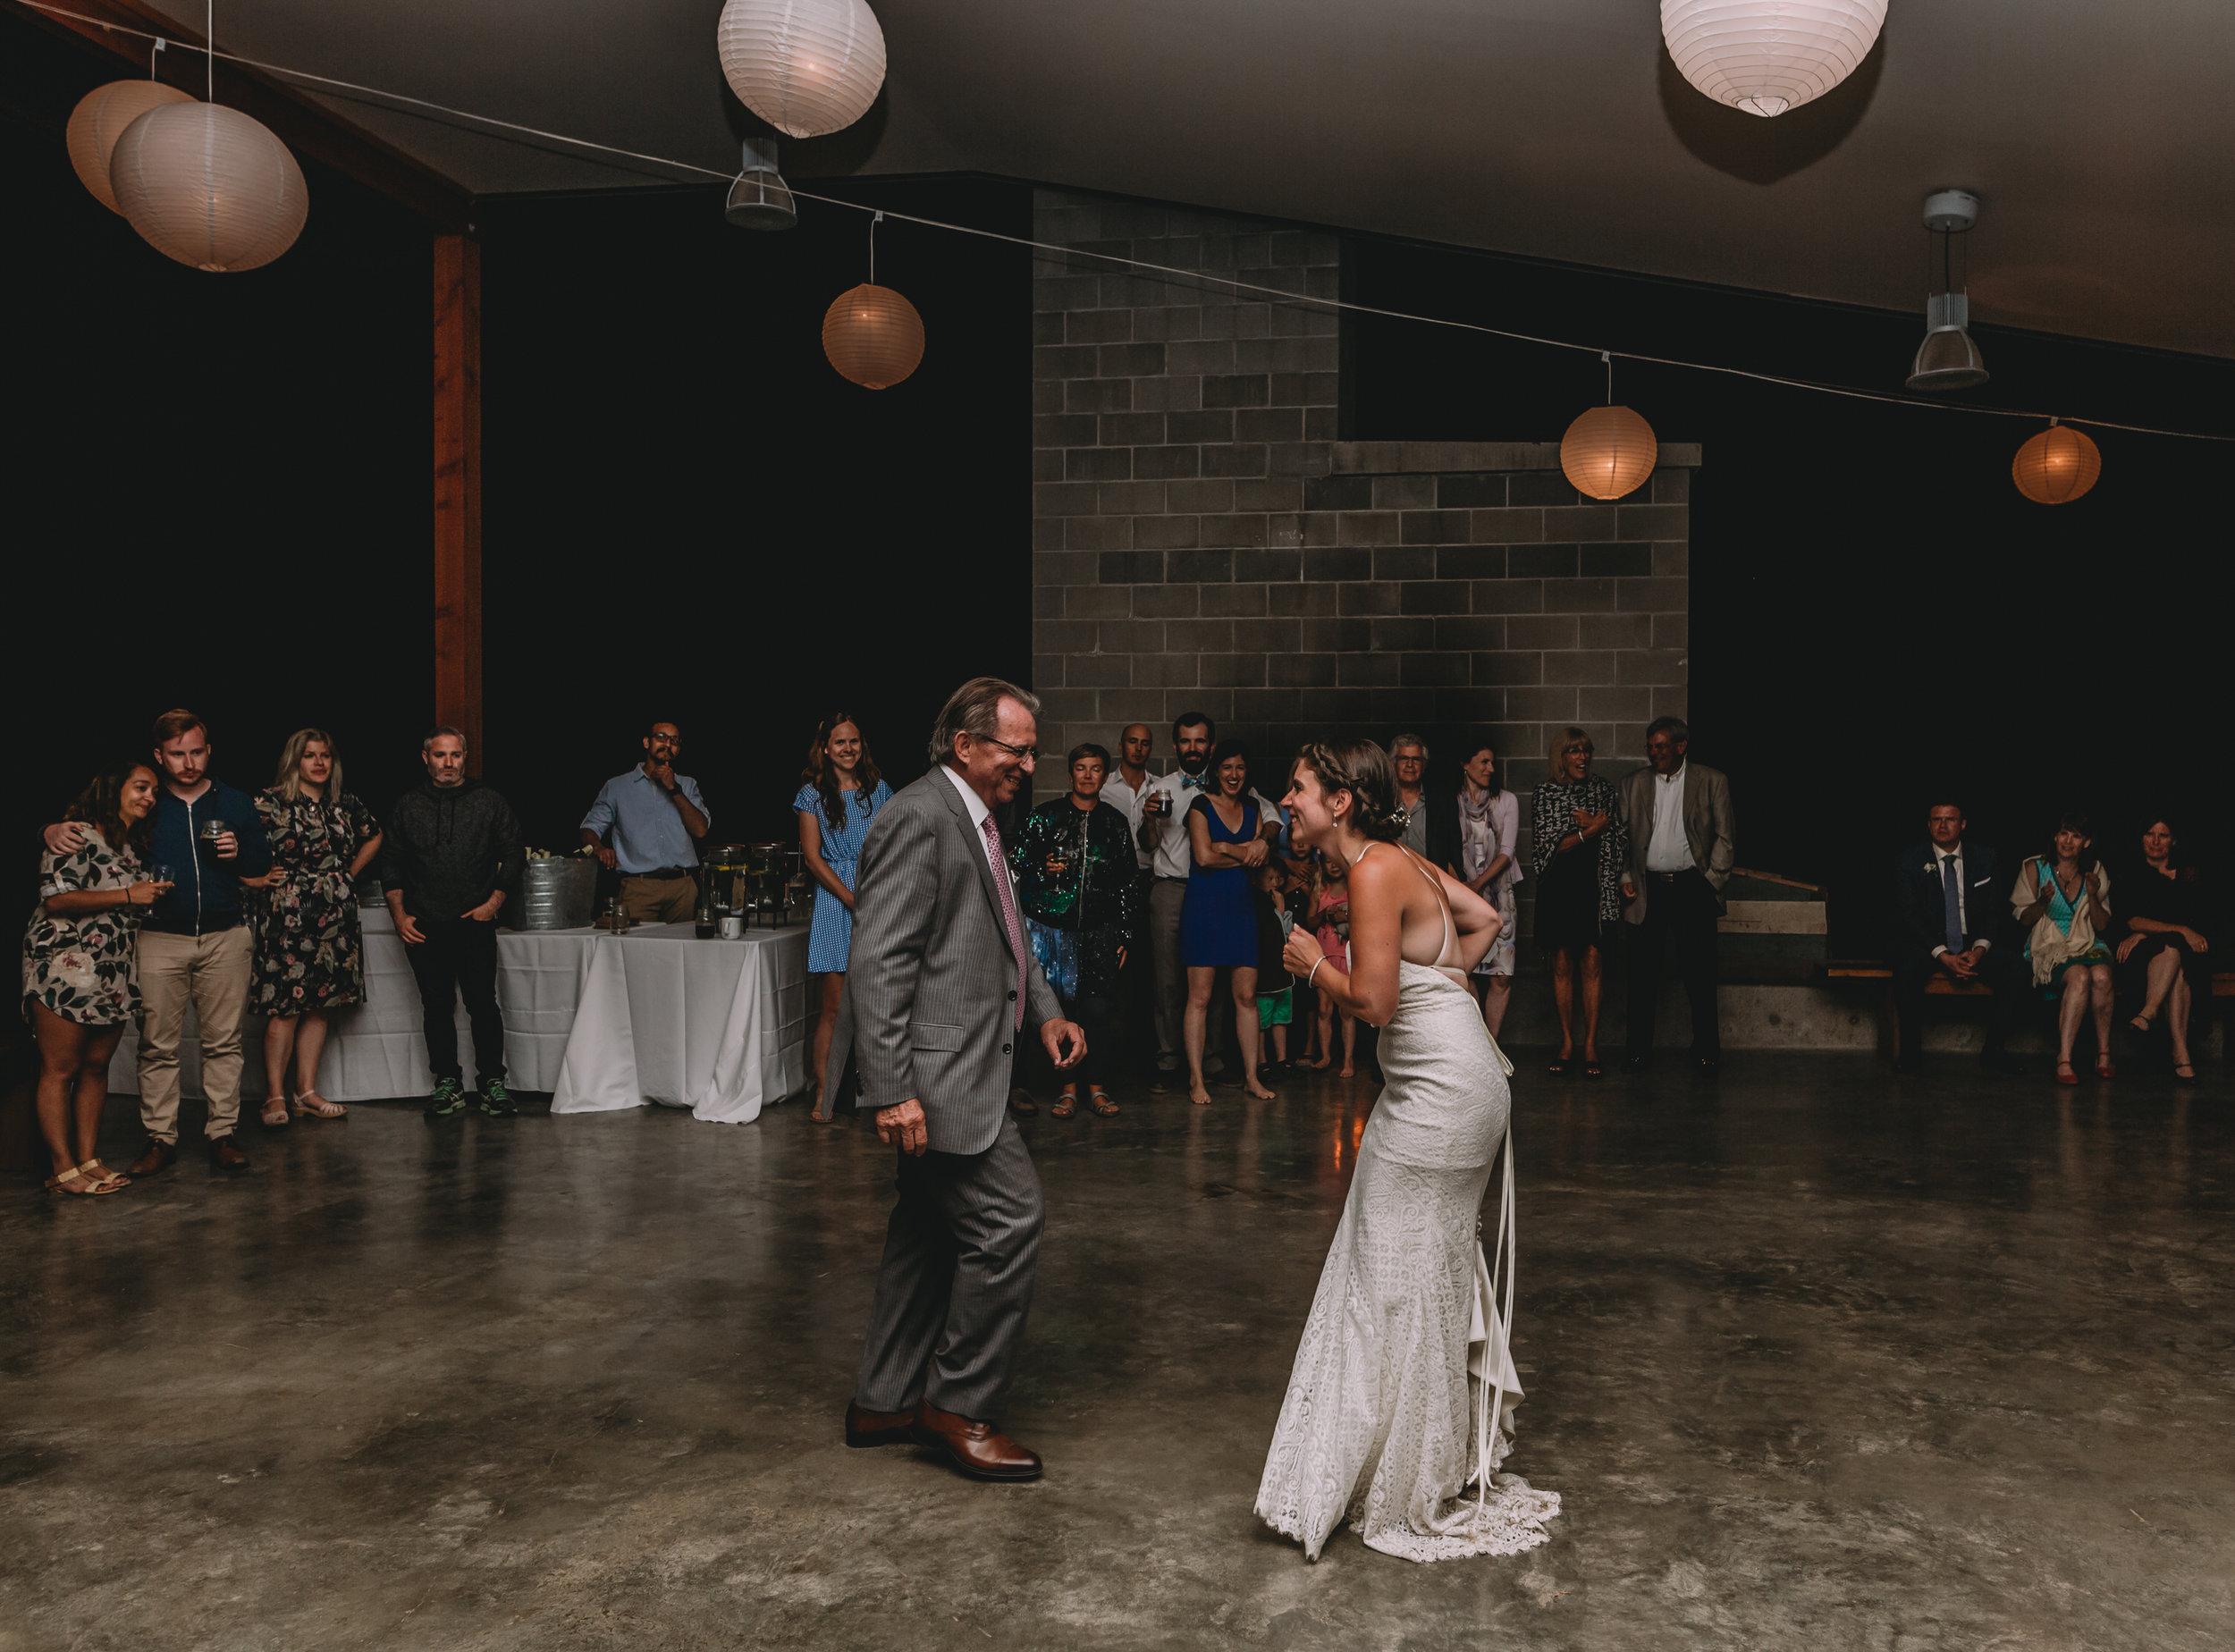 Camp Fircom Wedding - Vancouver Wedding Photographer & Videographer - Sunshine Coast Wedding Photos - Sunshine Coast Wedding Photographer - Jennifer Picard Photography - IMG_1910.jpg